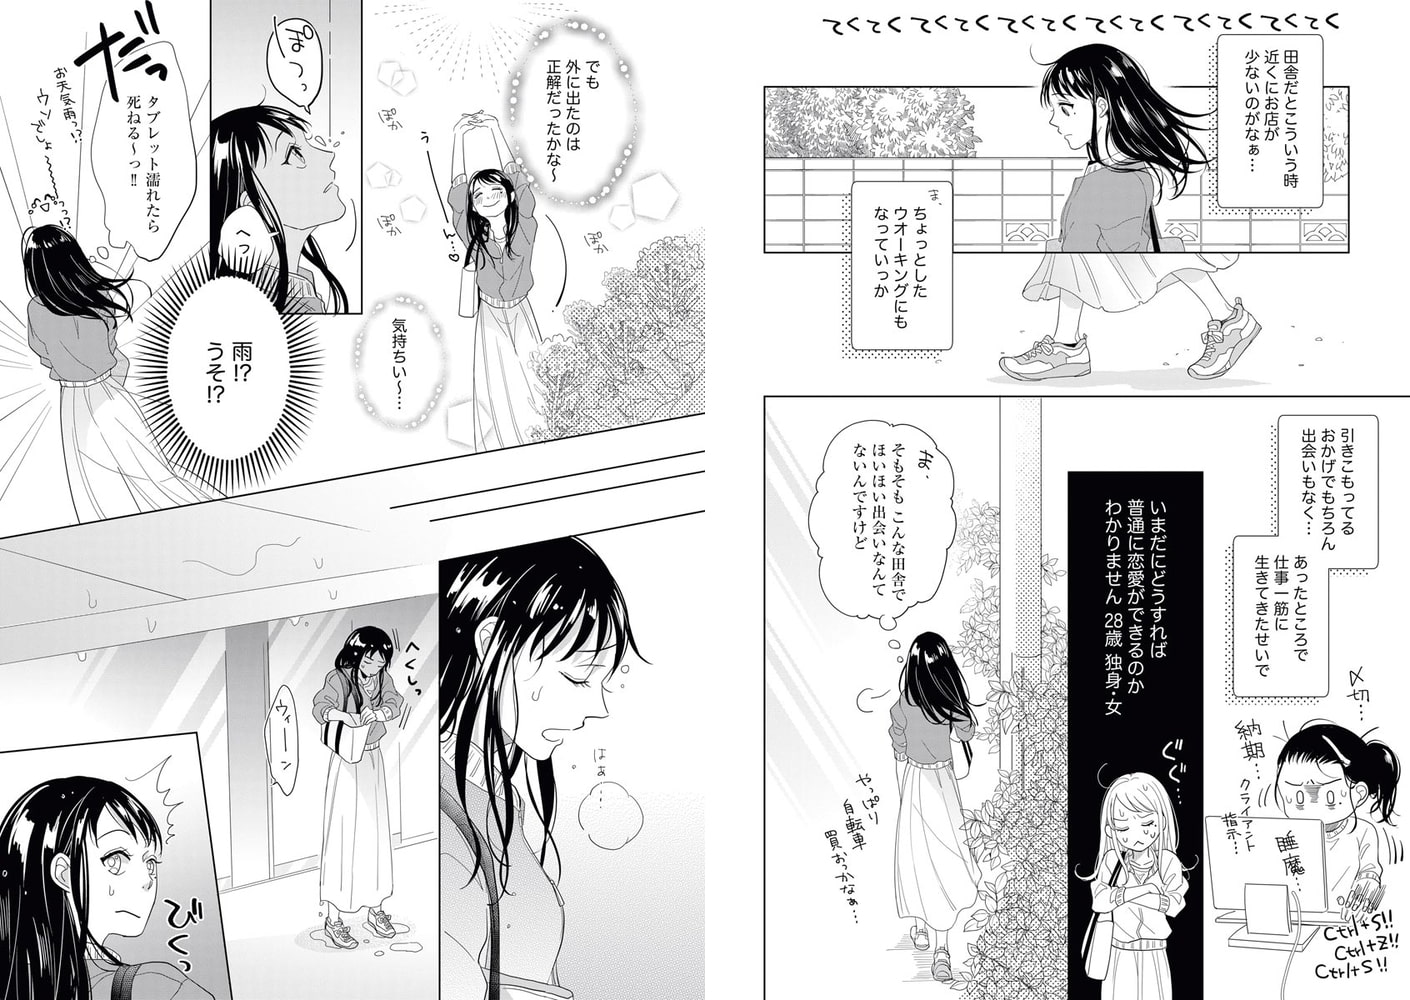 BJ247039 [20200627]イカつめオジサマと秘蜜のトレーニング ~彼は私の初×相手…!?~(単話版)